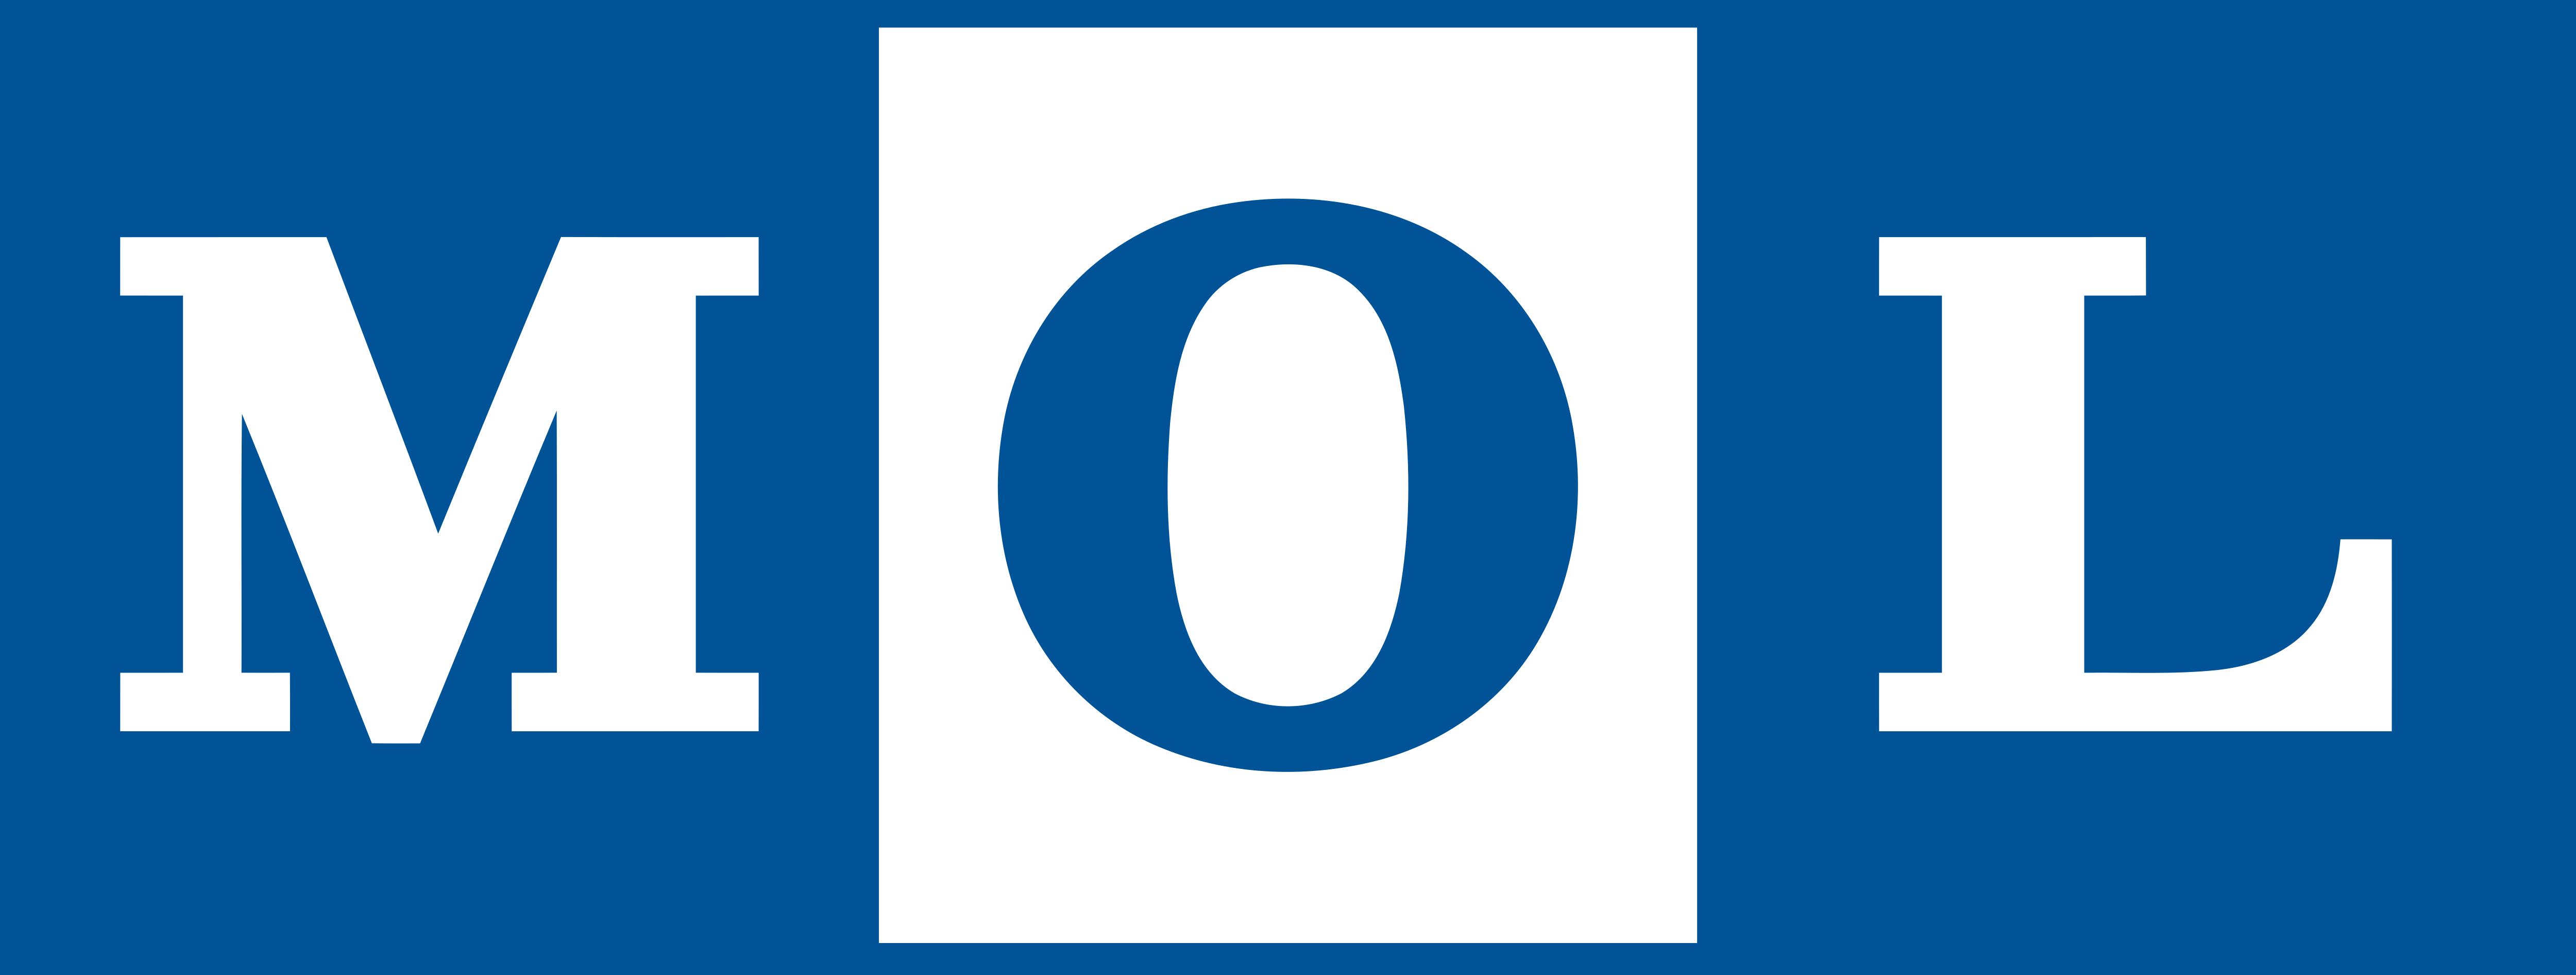 mitsui osk lines � logos download